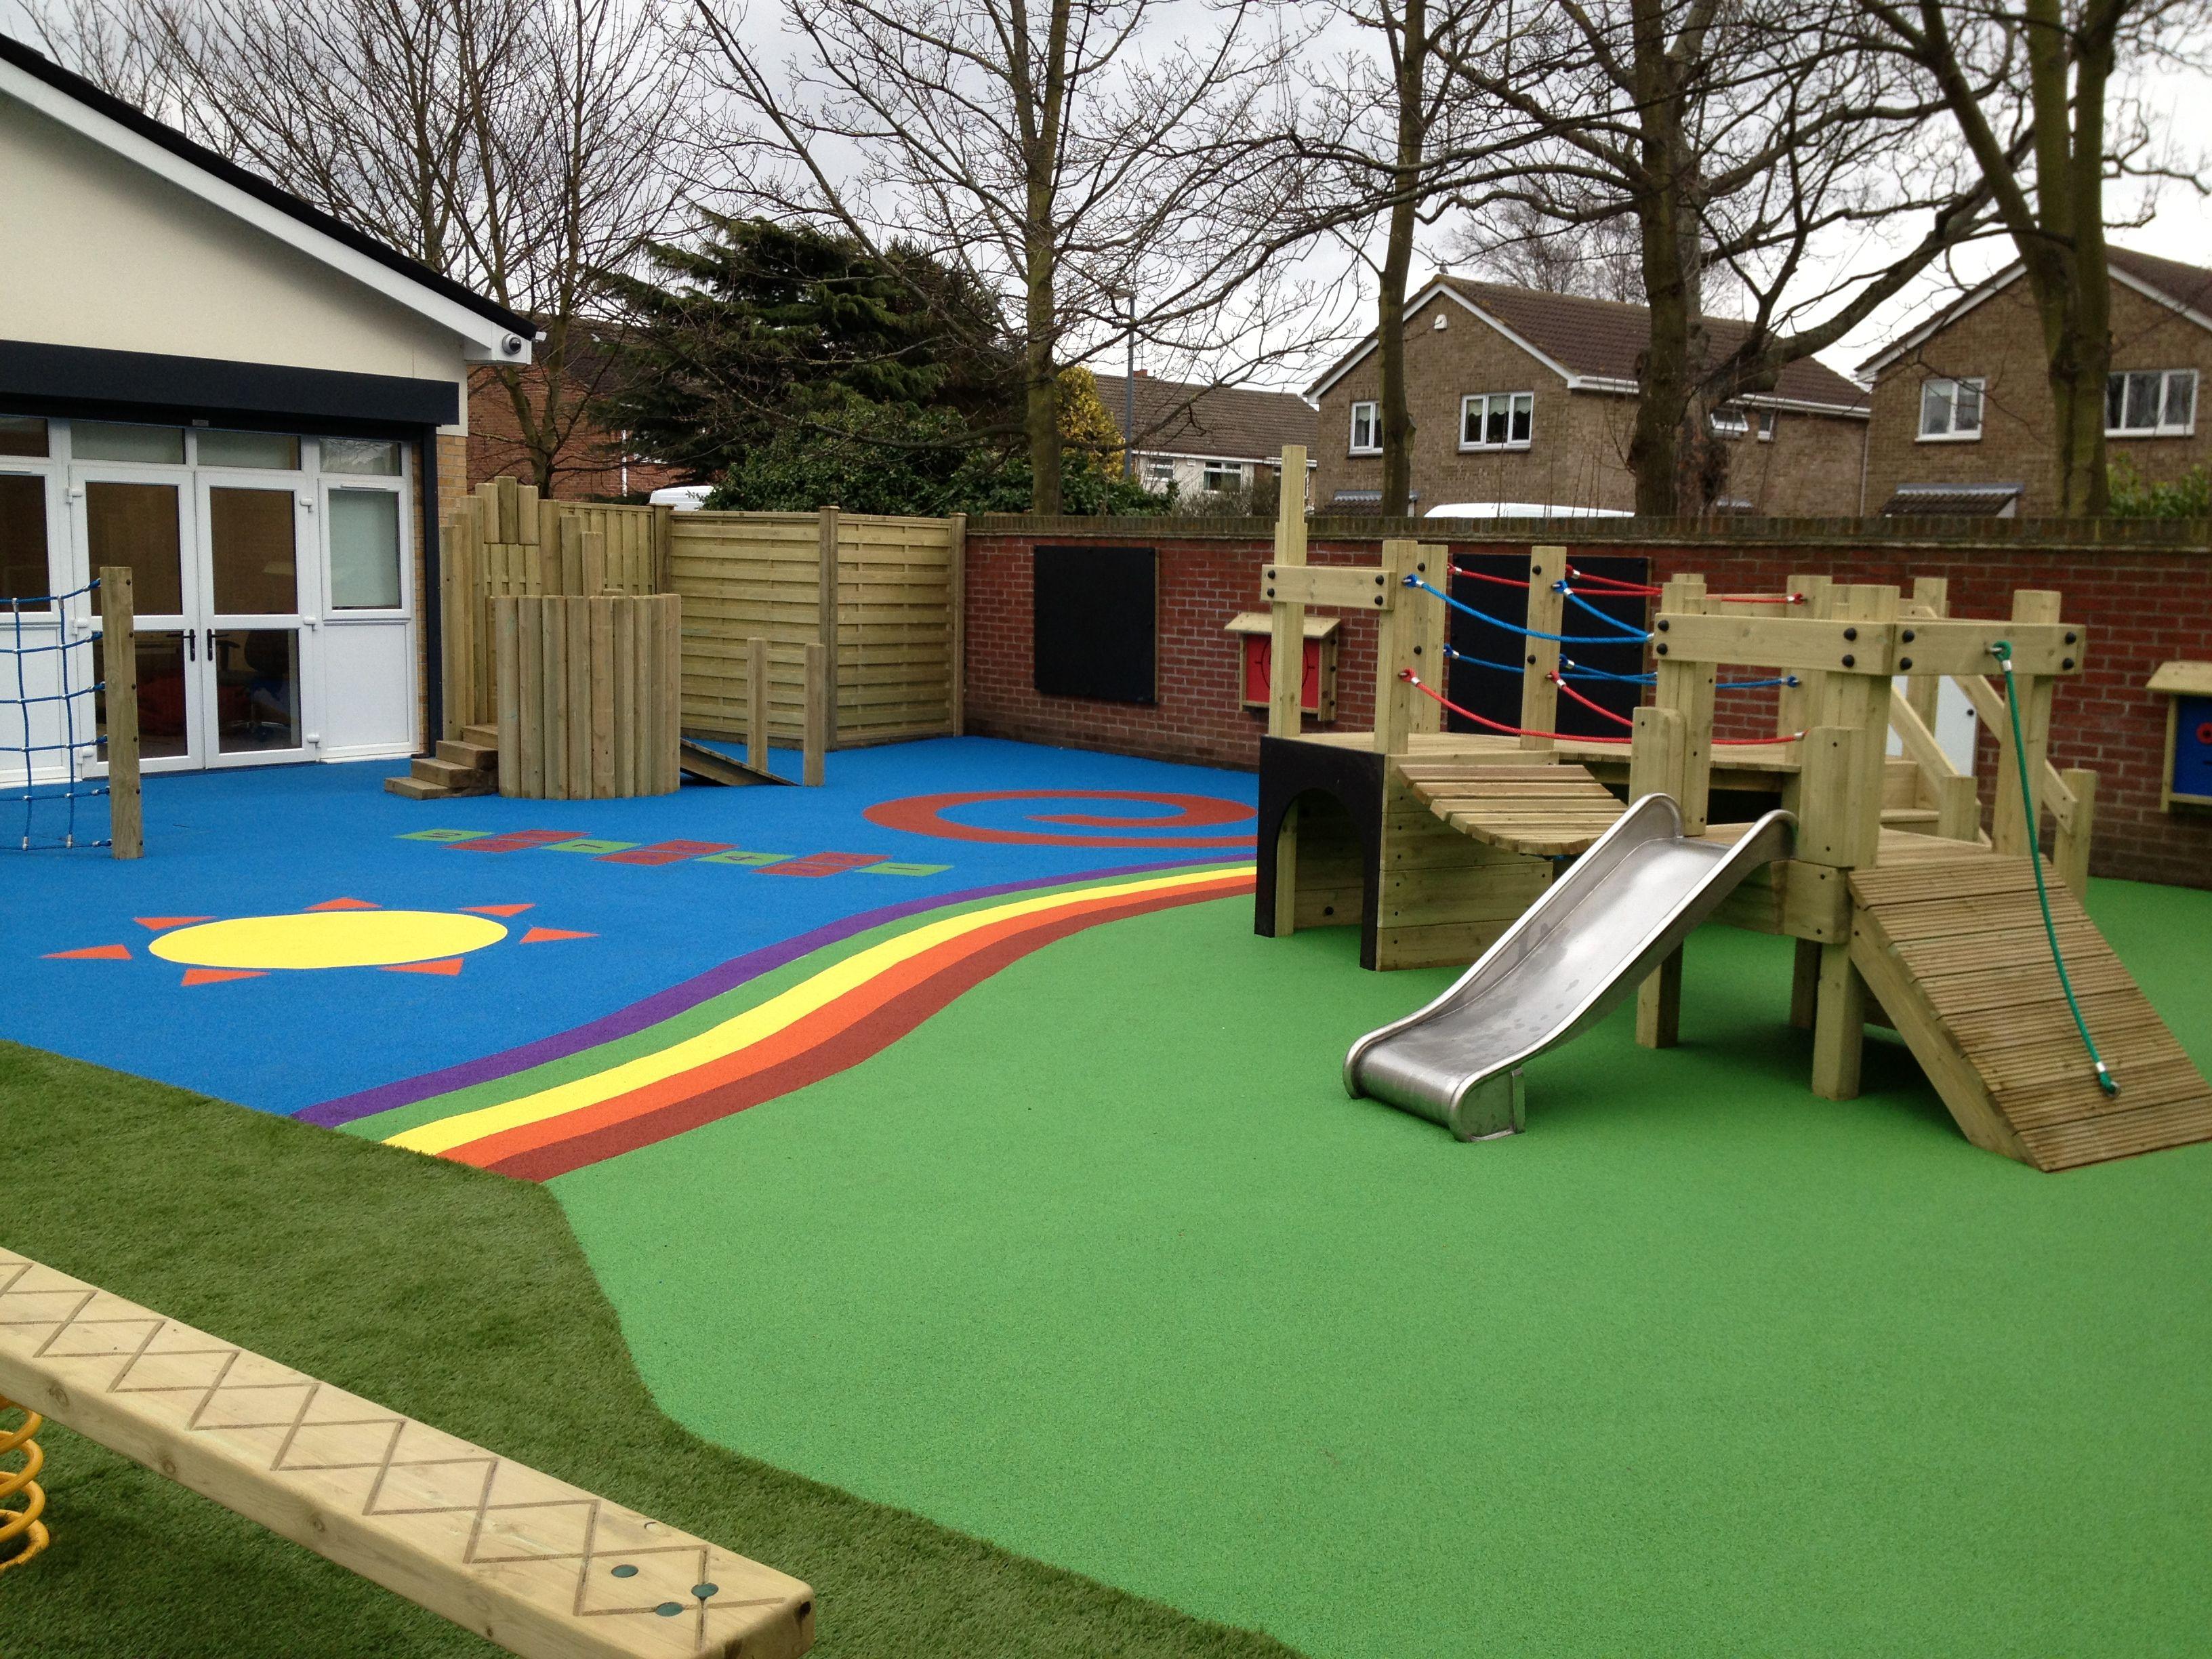 School playground equipment nursery school play for Playground equipment ideas